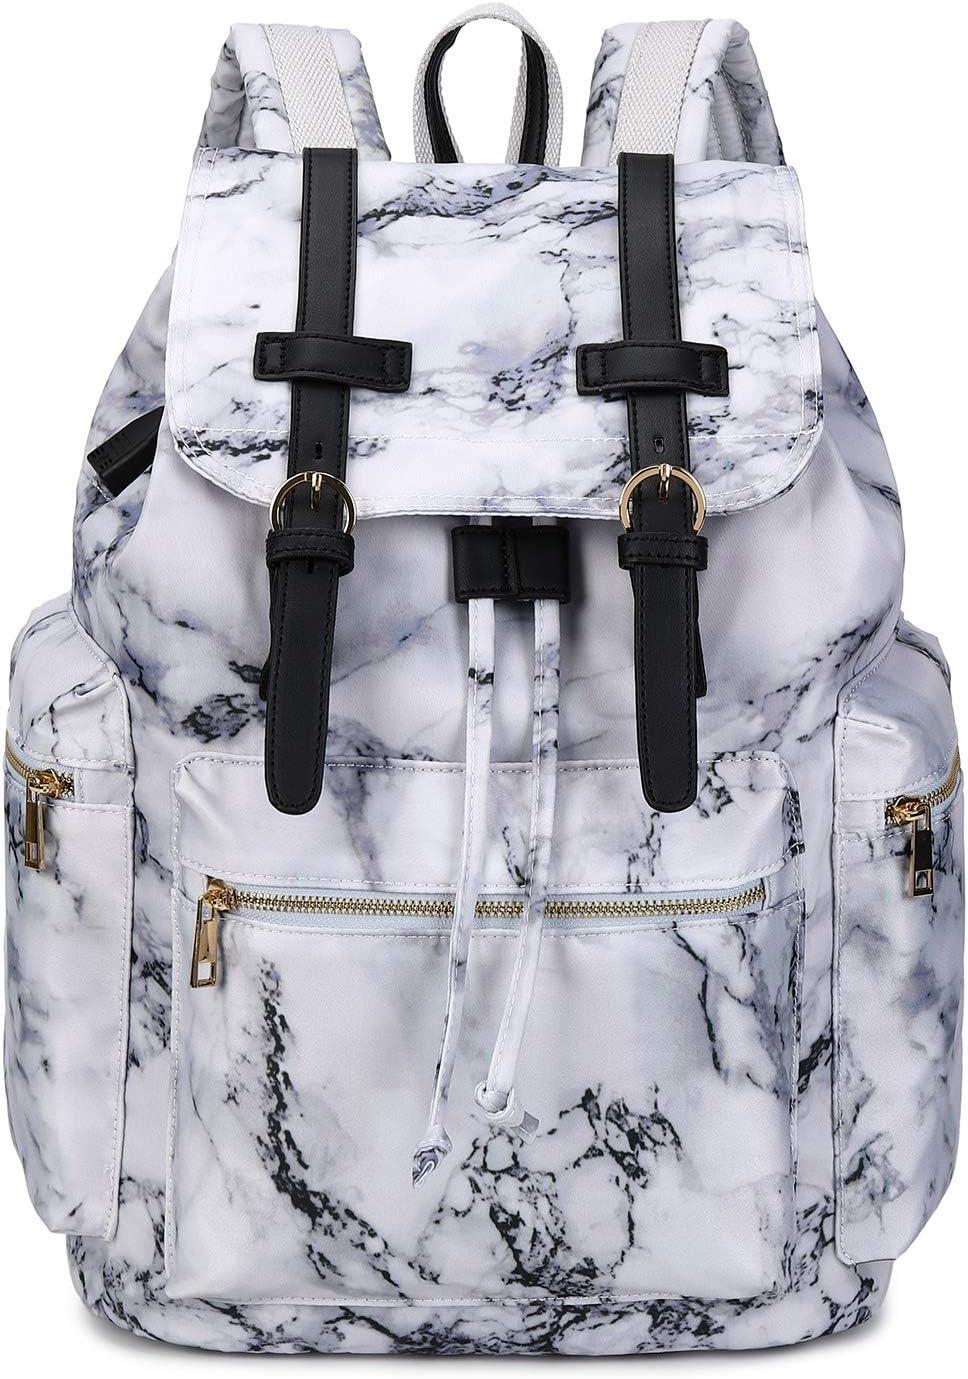 Lady Campus Student Rucksack Girl/'s Velour Backpack Schoolbag Knapsack Backpacks